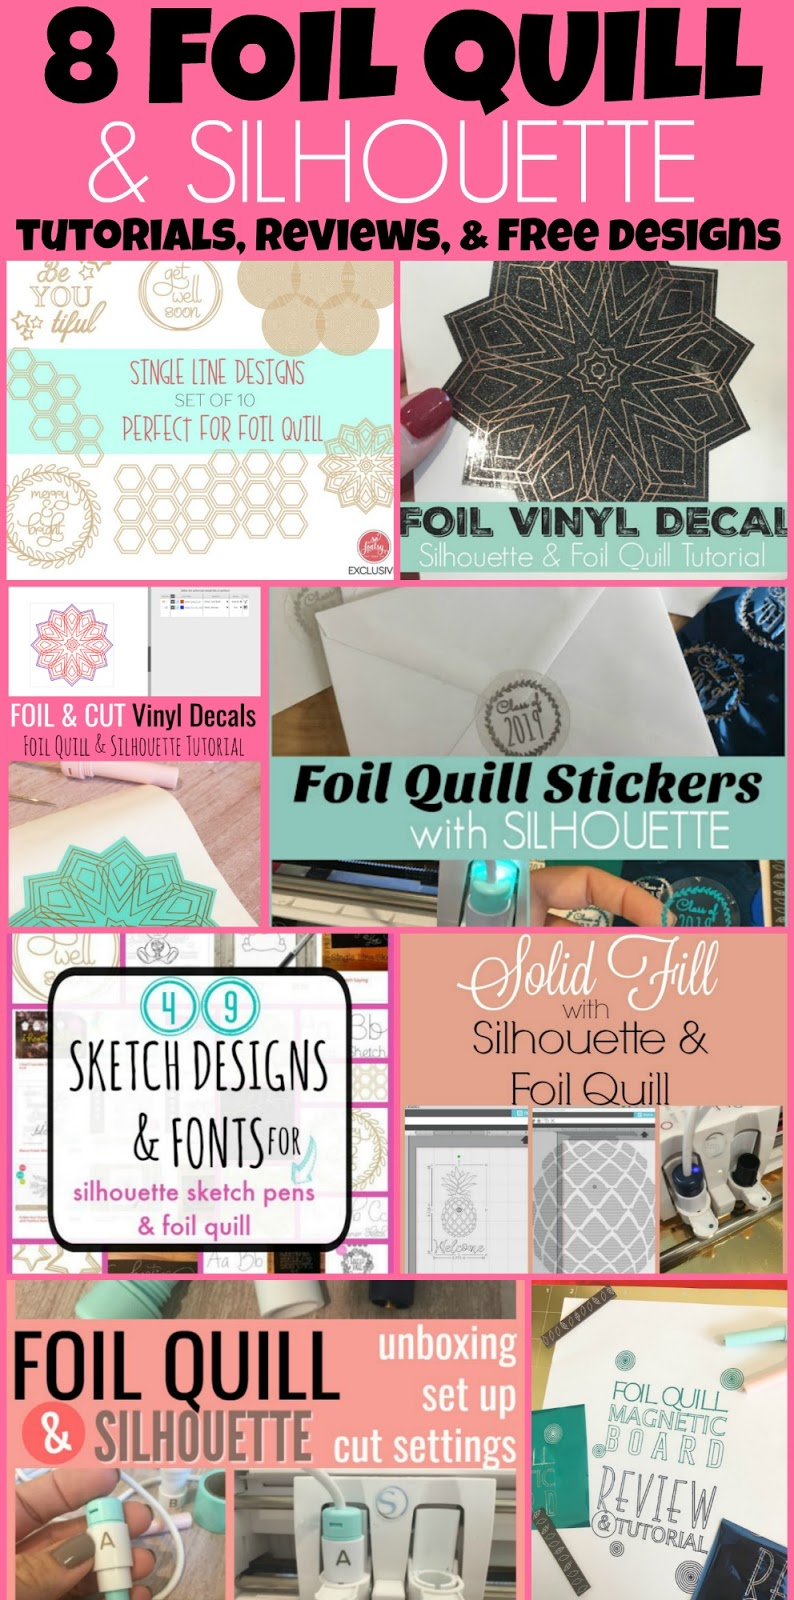 foil quill silhouette, foil quill designs, foil quill tutorials, foil quill magnetic mat, foil quill magnet mat board